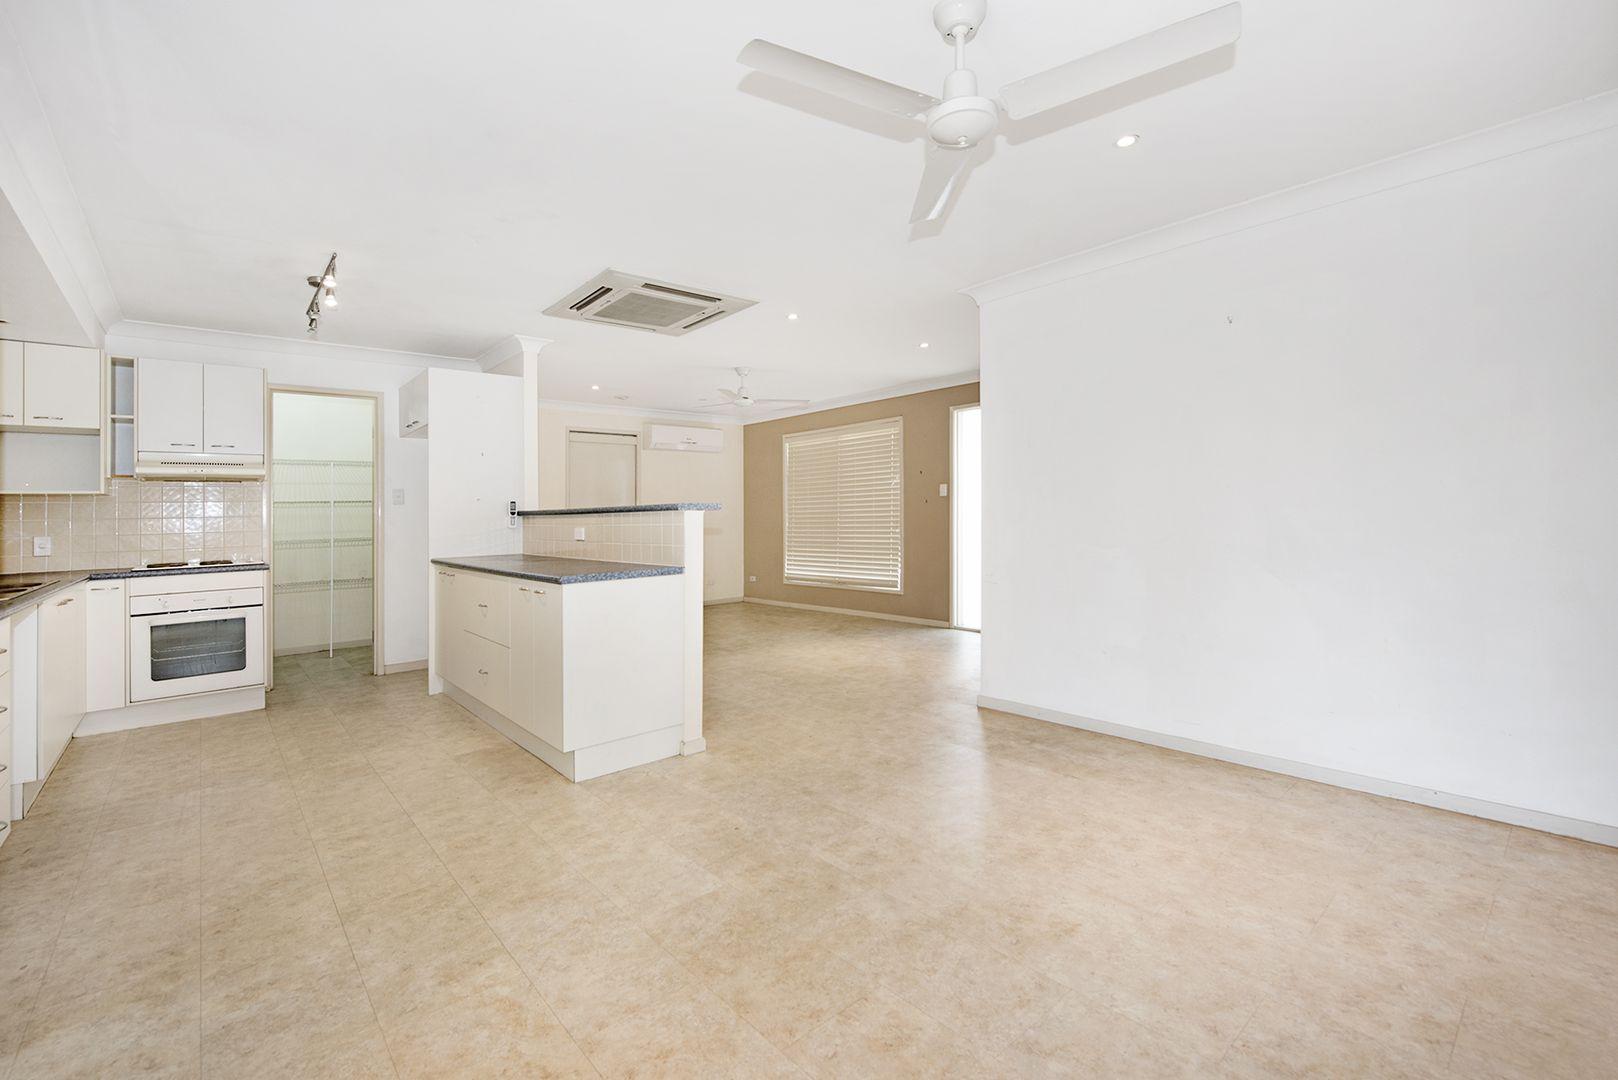 182 Cross Street, Goodna QLD 4300, Image 2